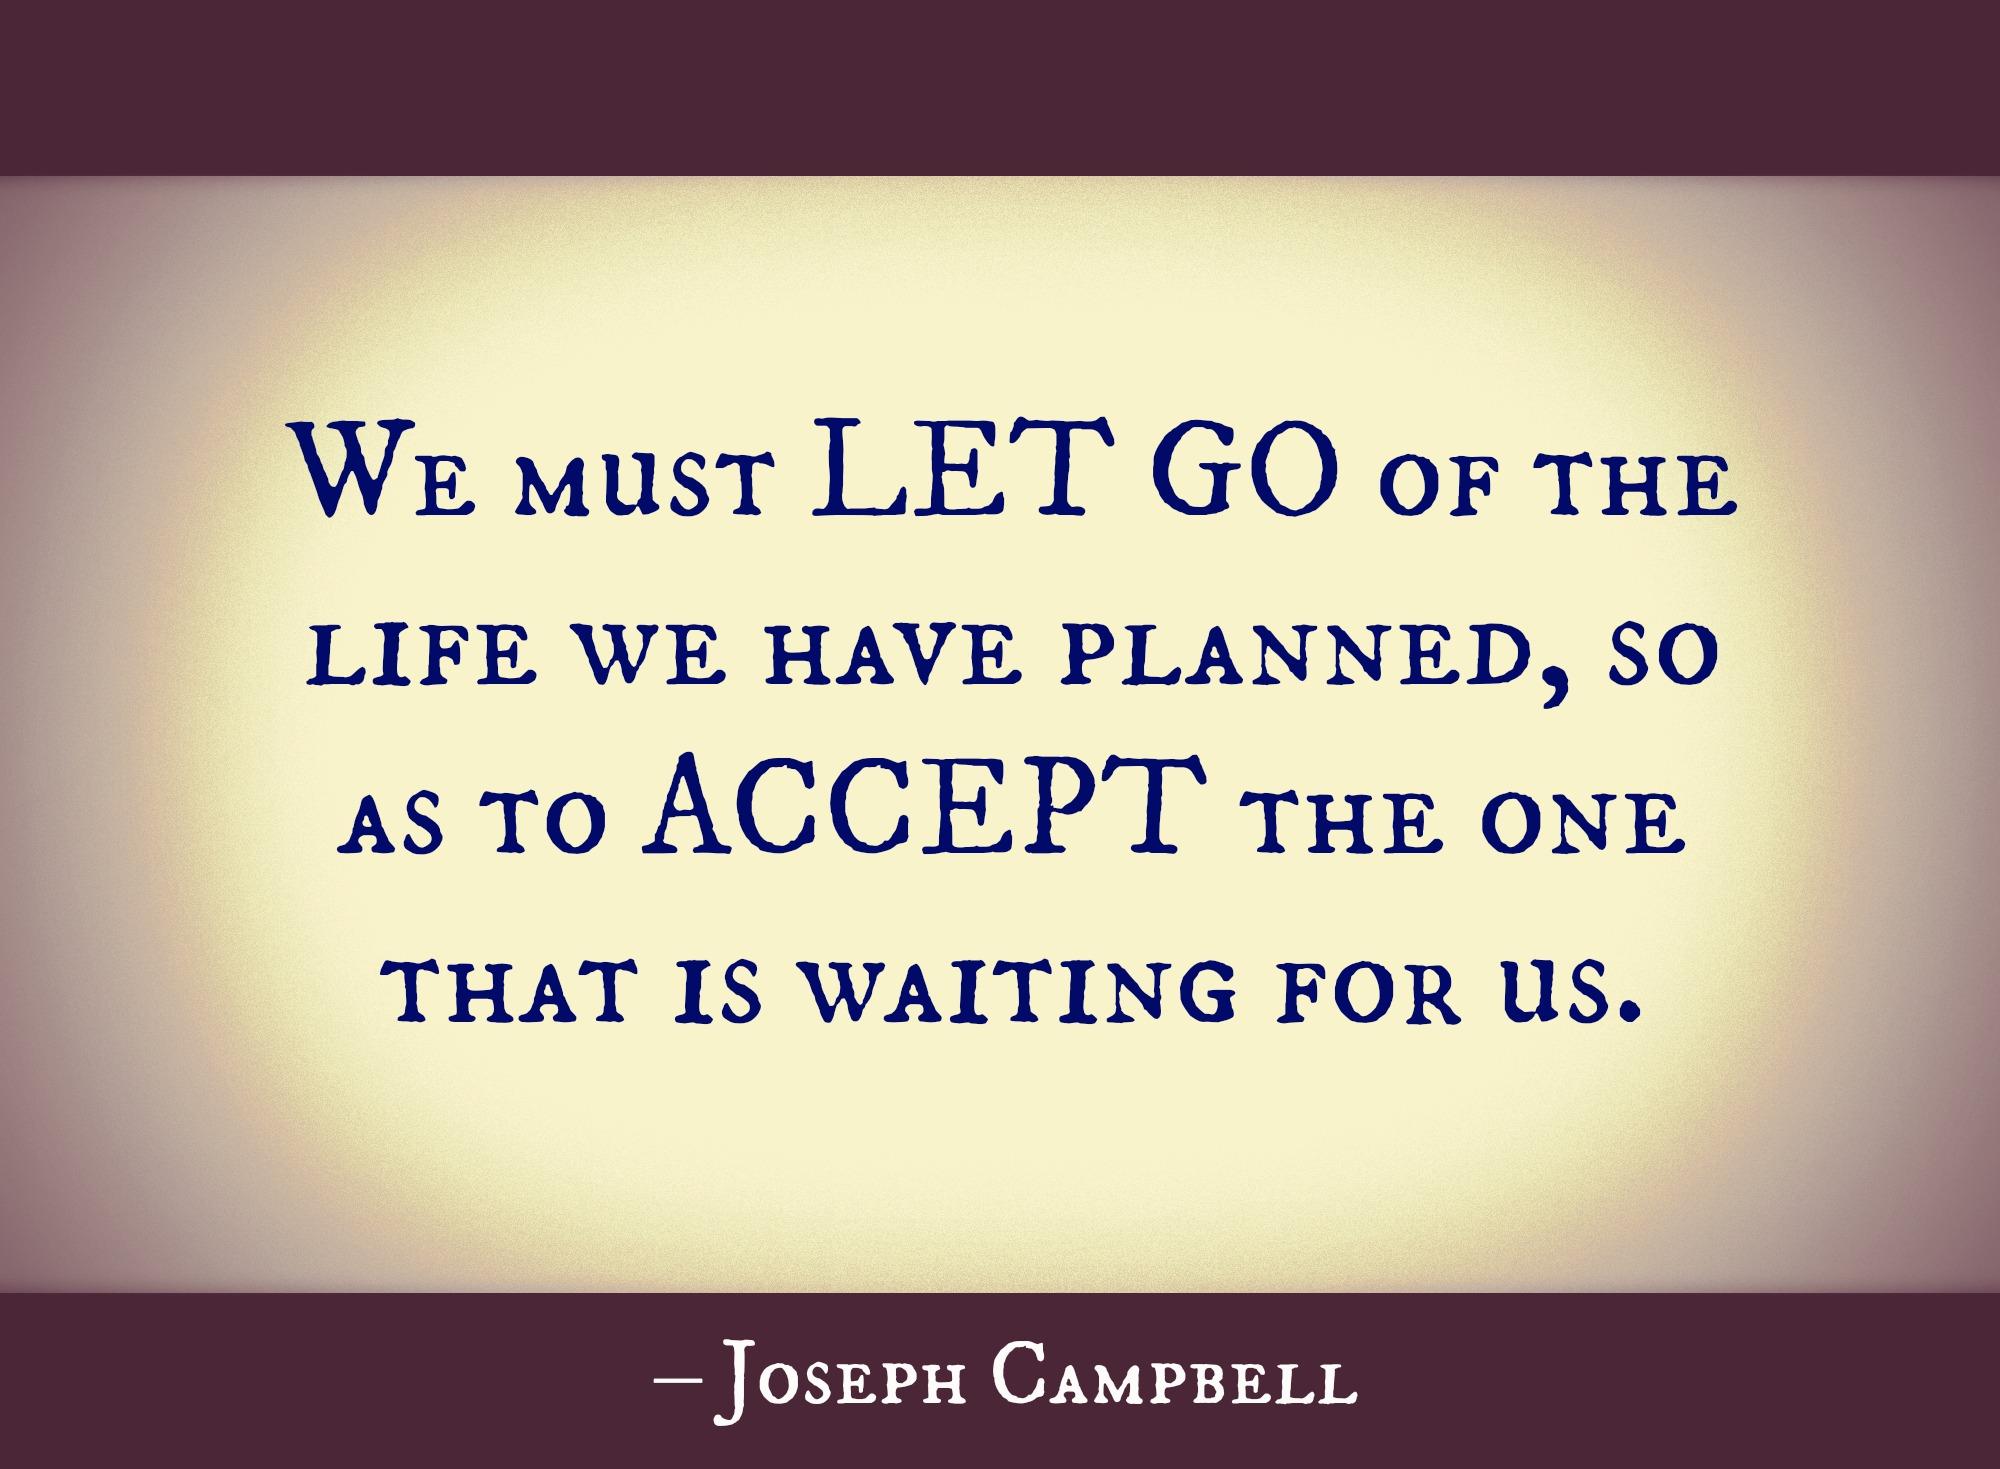 Joseph Campbell_letgo